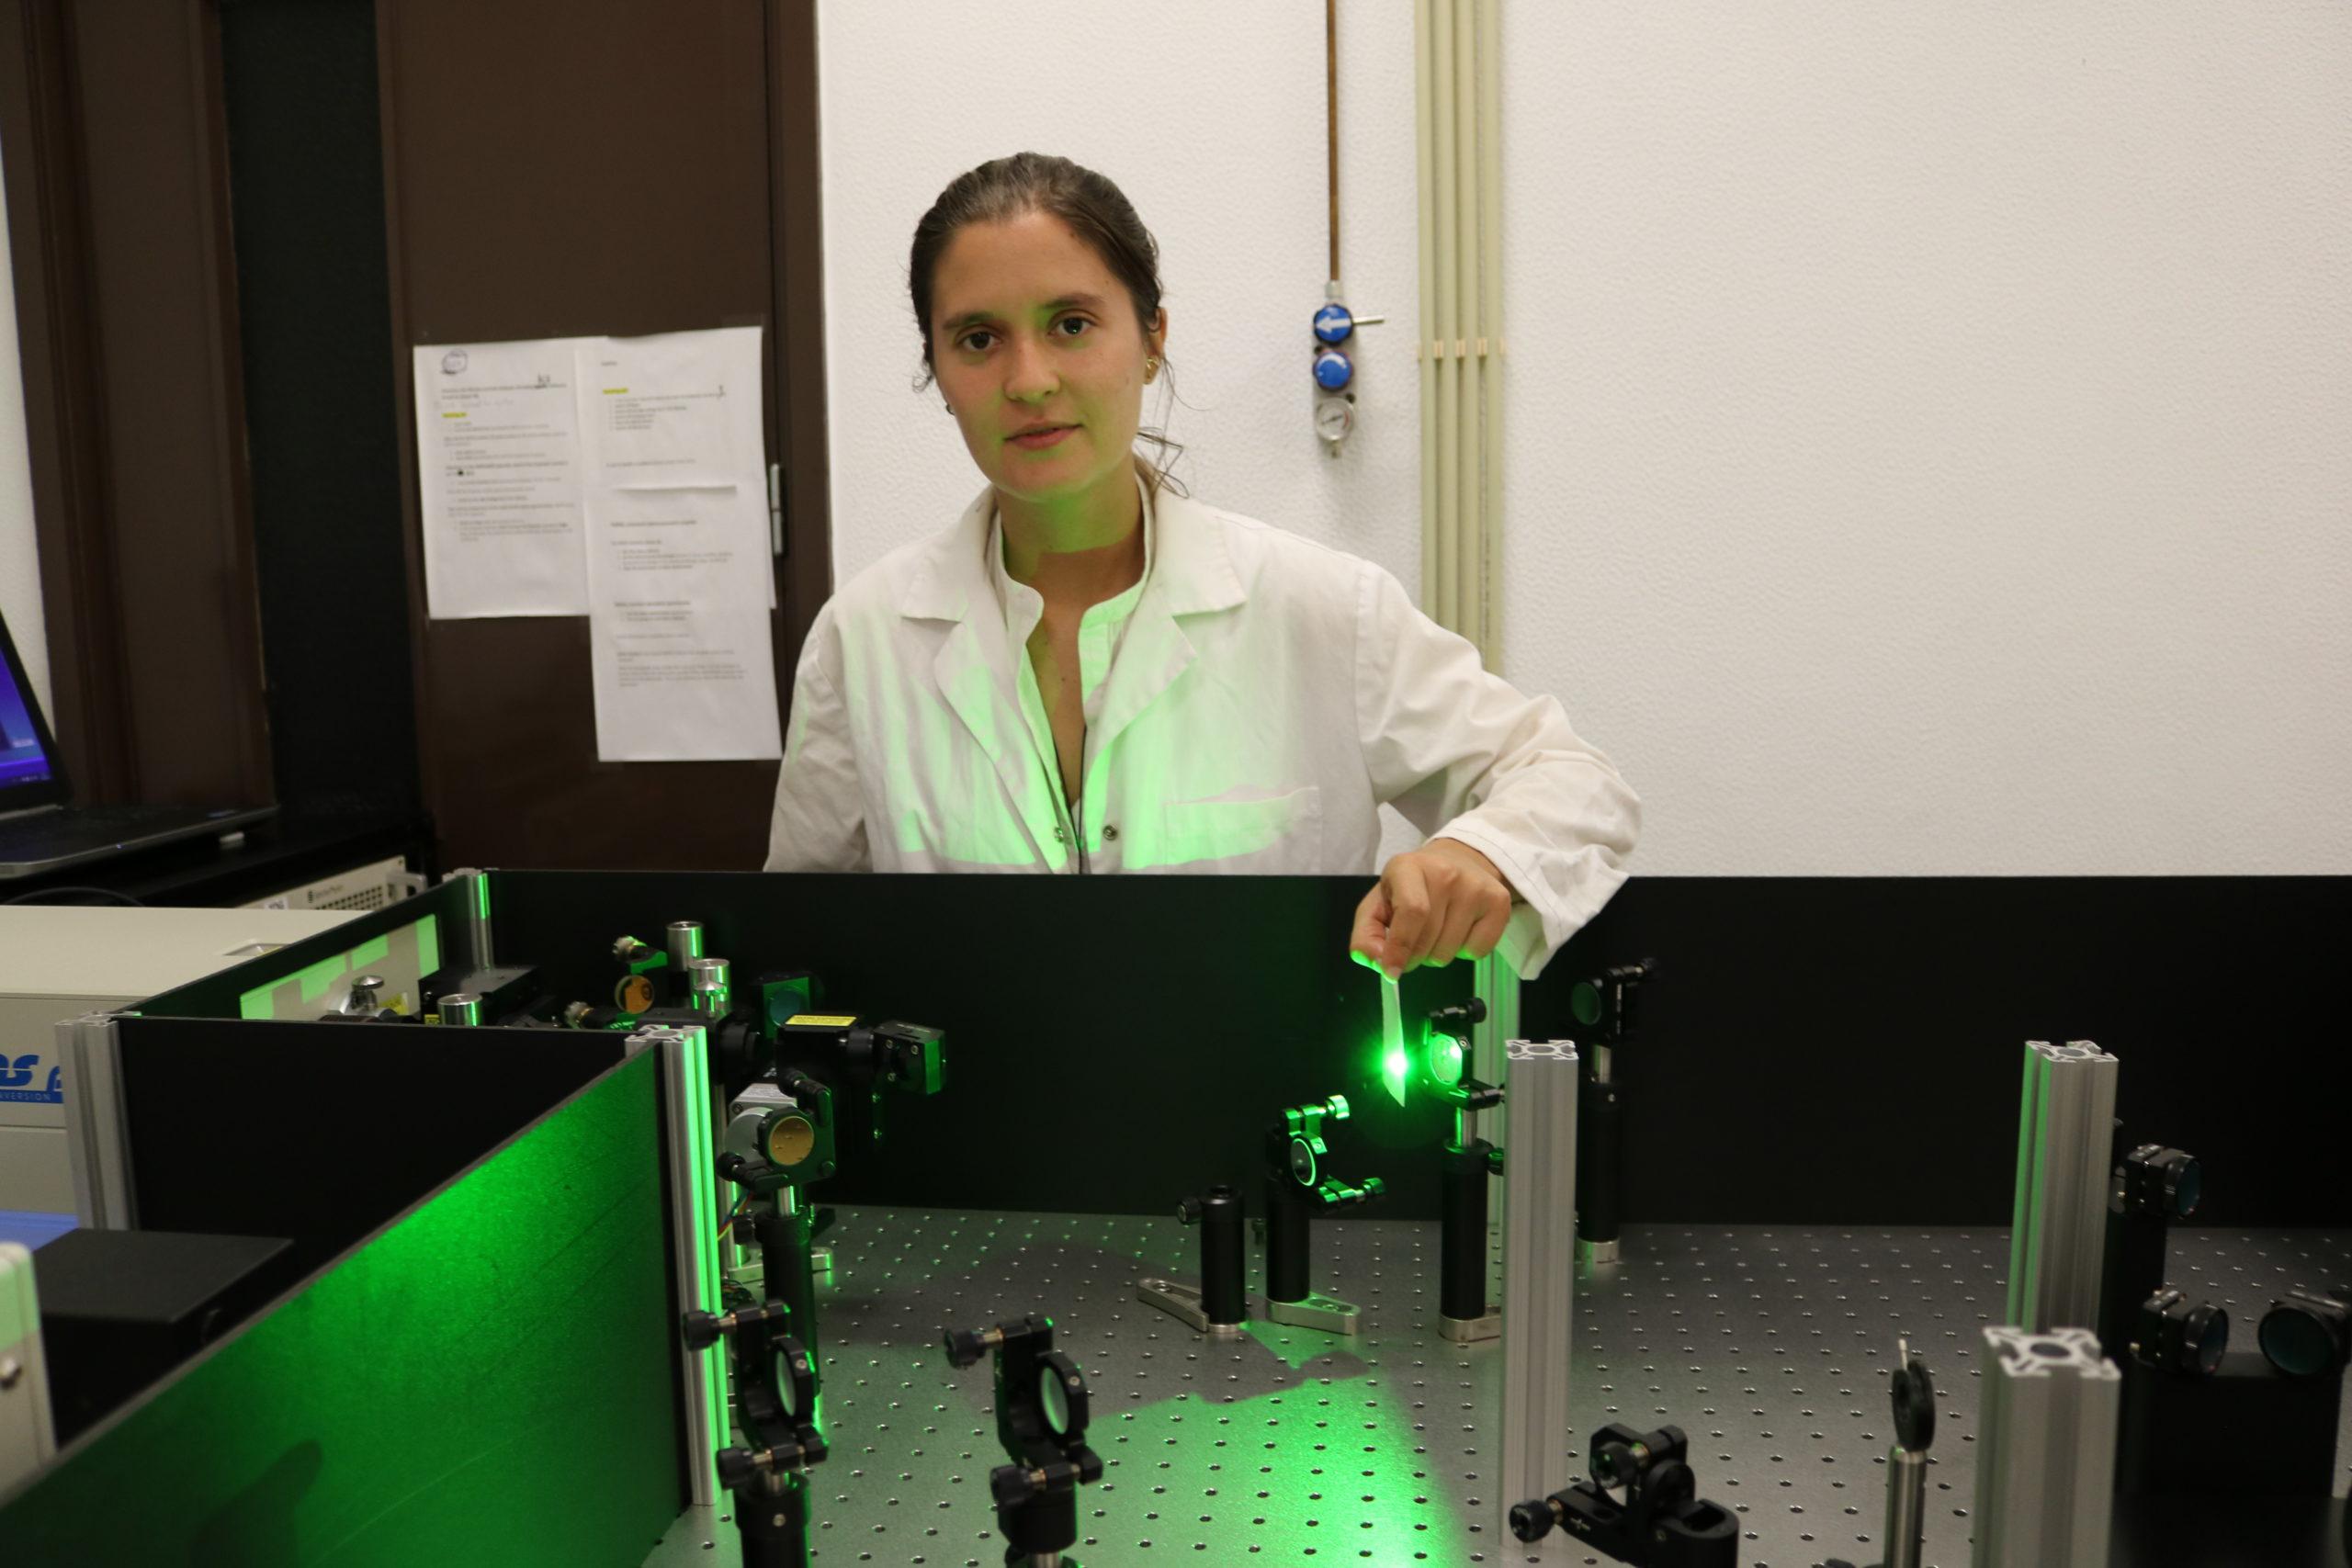 Danîela Nobre aligning the pump & probe laser of the fs-TA